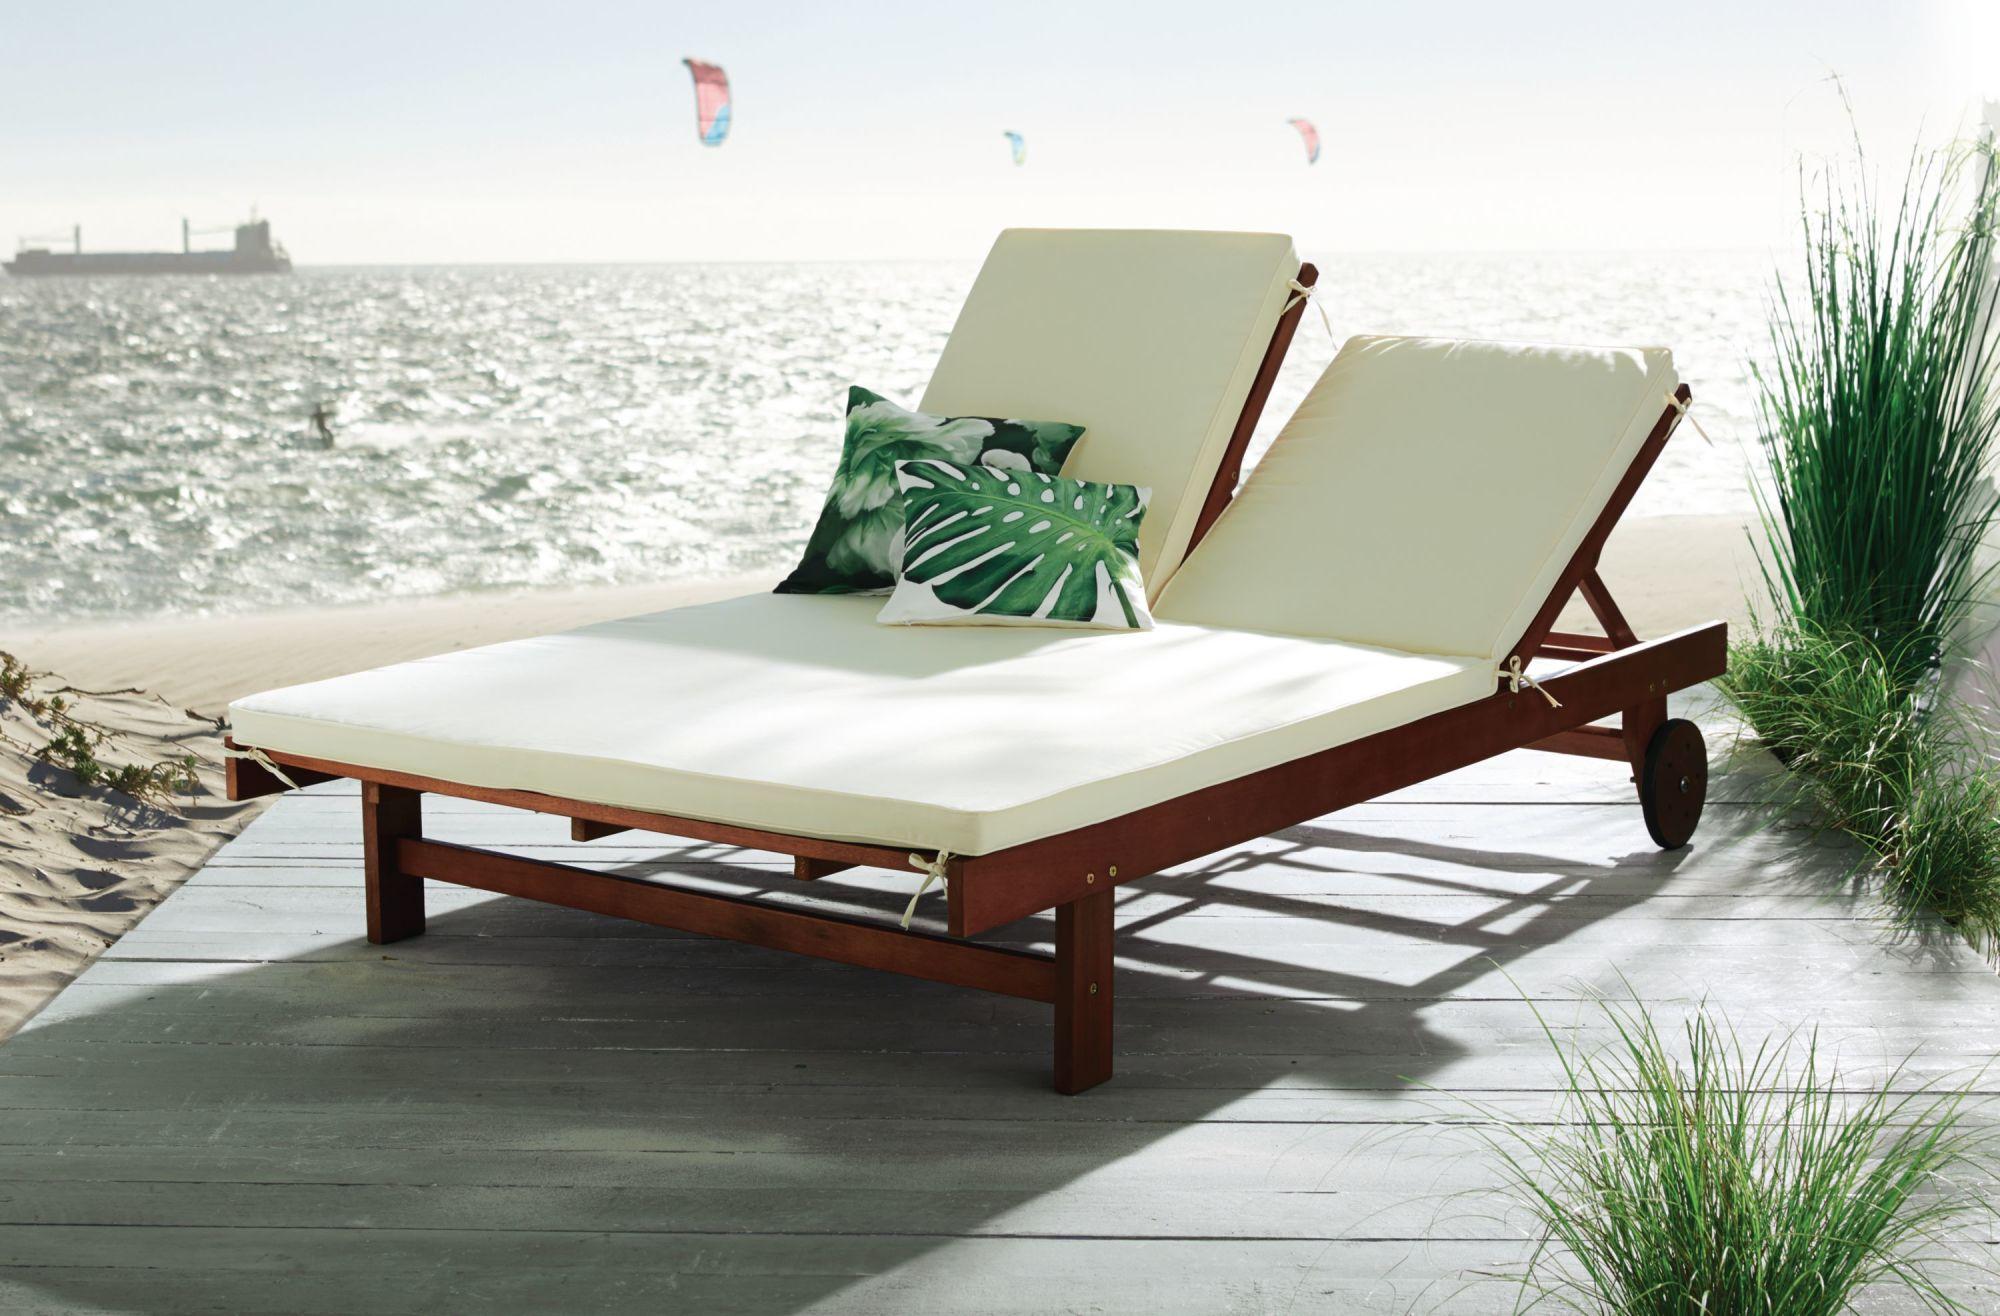 sonnenliege holz mit auflage. Black Bedroom Furniture Sets. Home Design Ideas